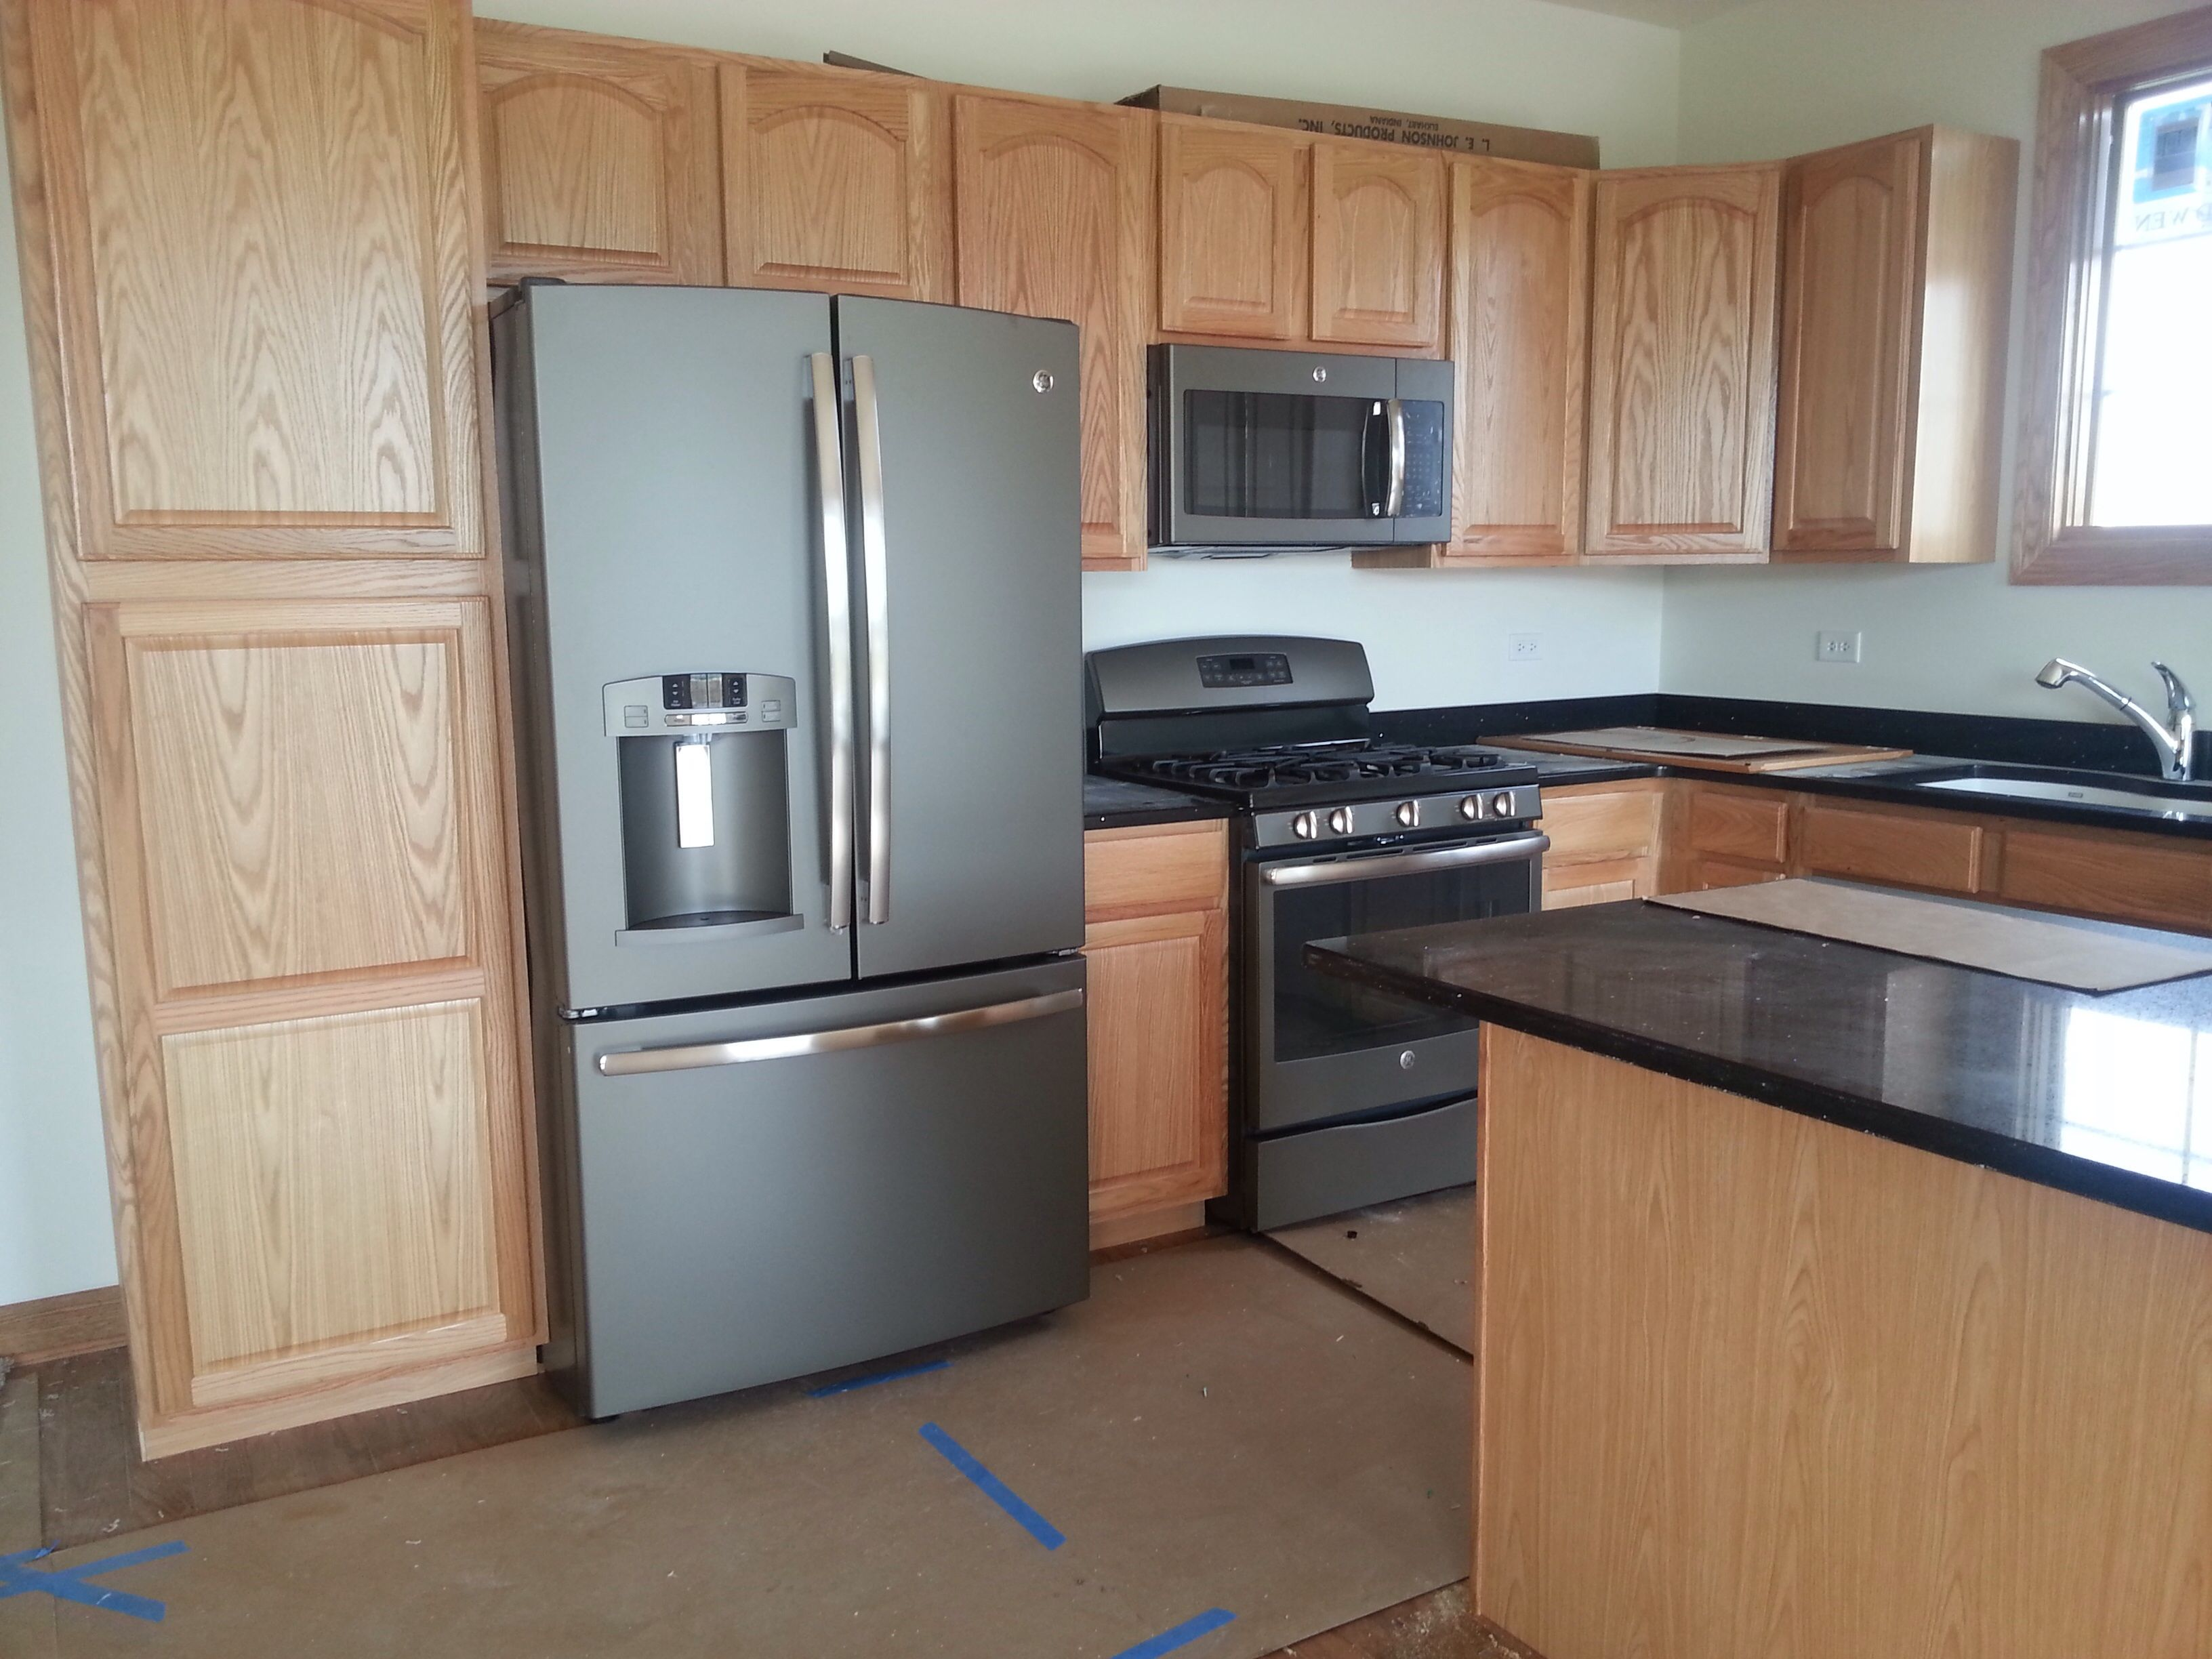 ge kitchen appliances aerator for faucet slate whisper creek townhomes in mokena